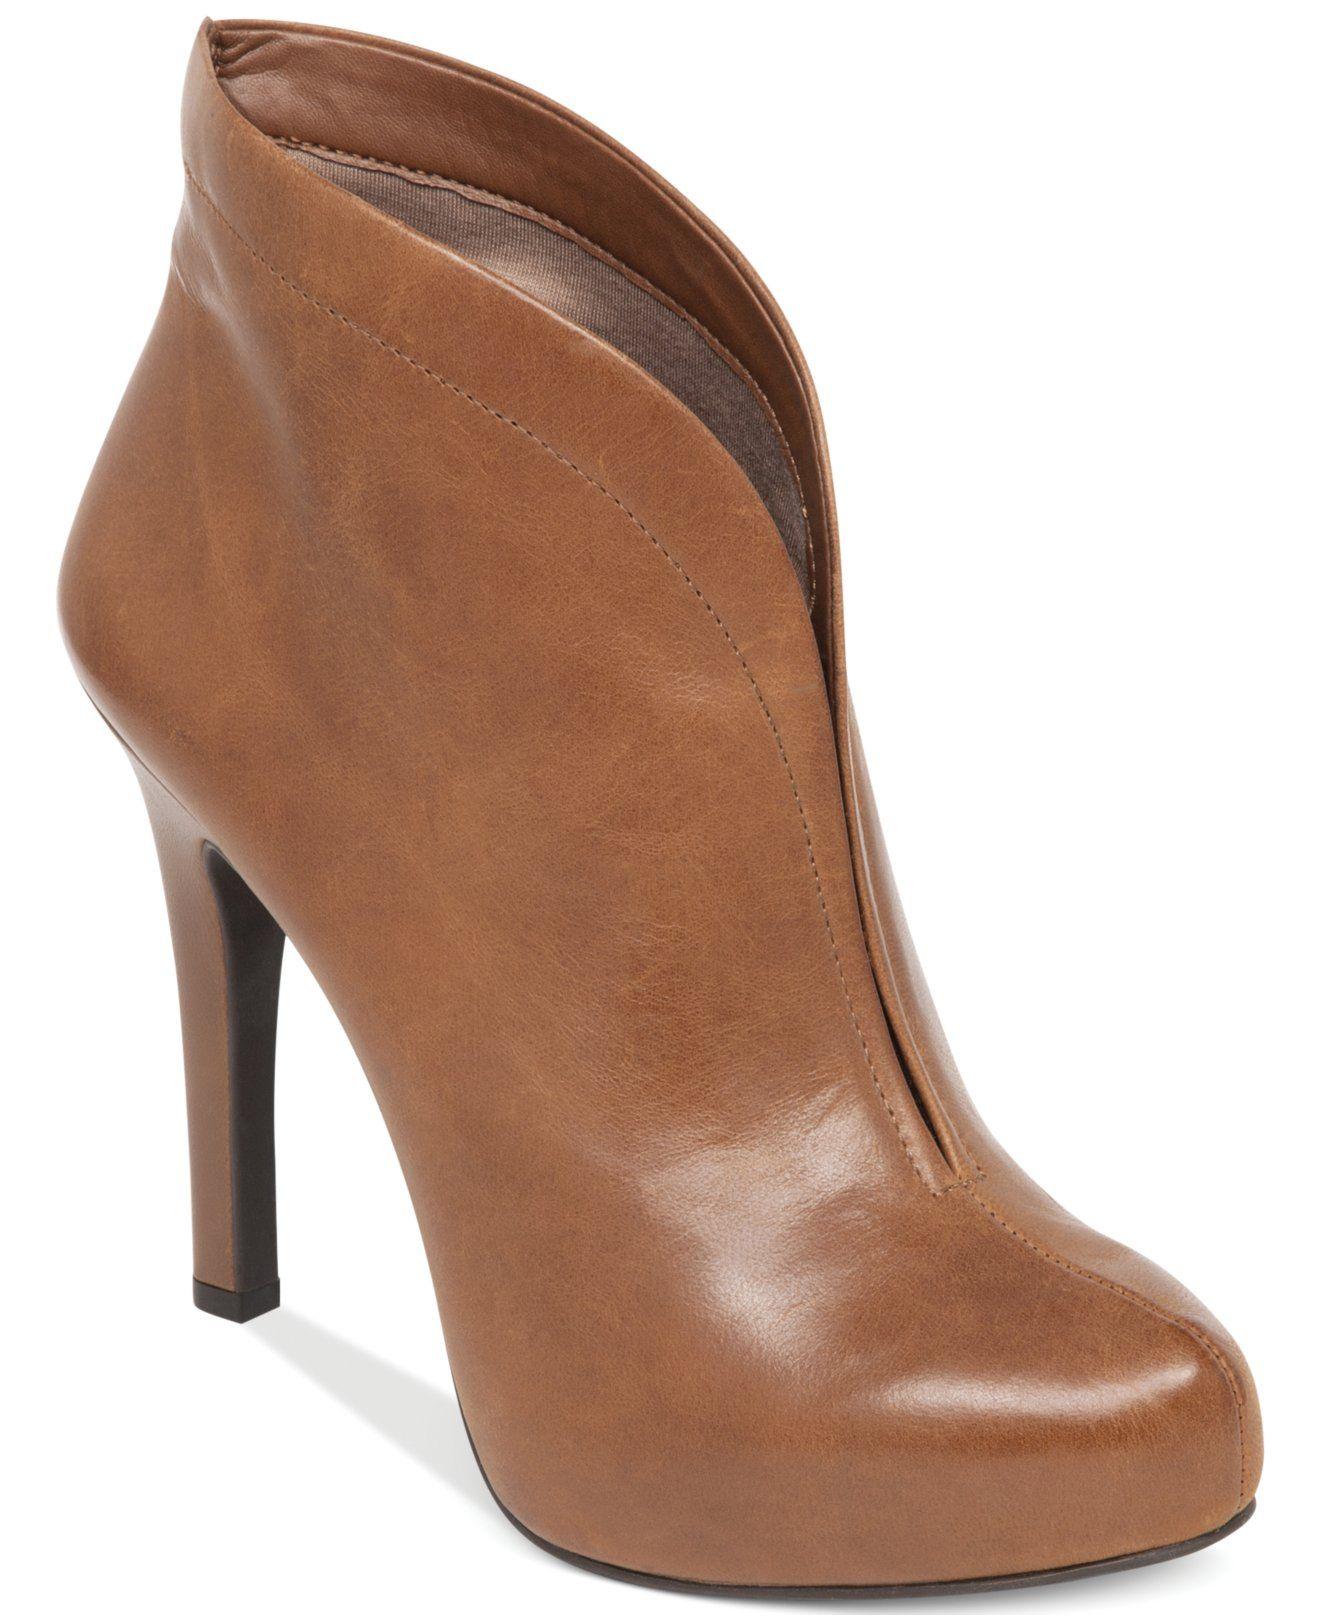 Jessica Simpson Allest Shooties Boots Shoes Macy's